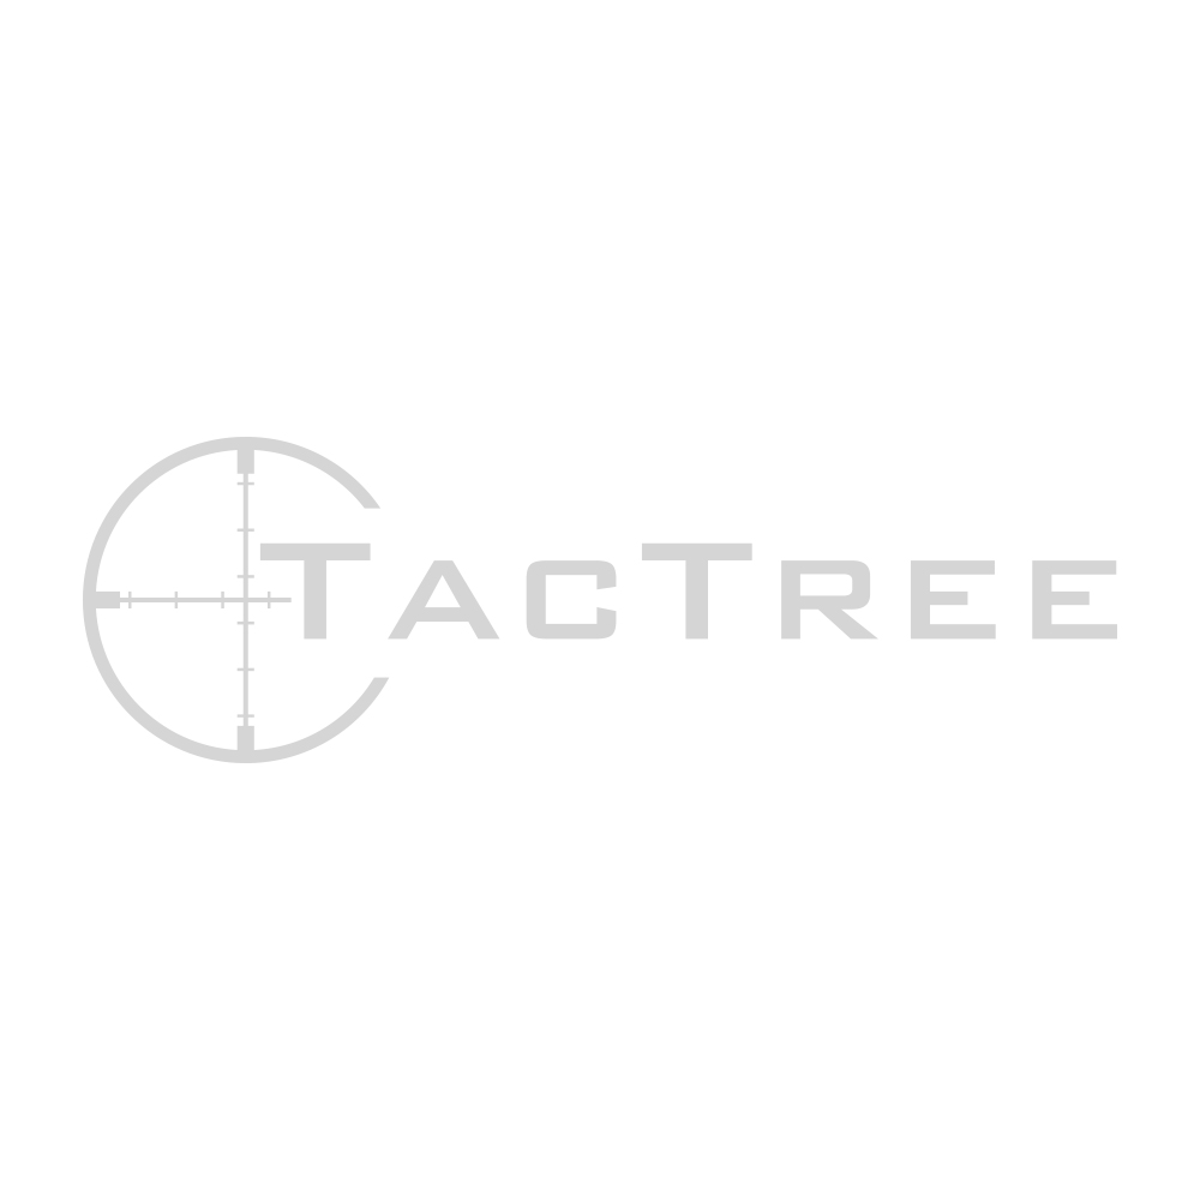 5.11 GEO7 TacTec Plate Carrier (Night)